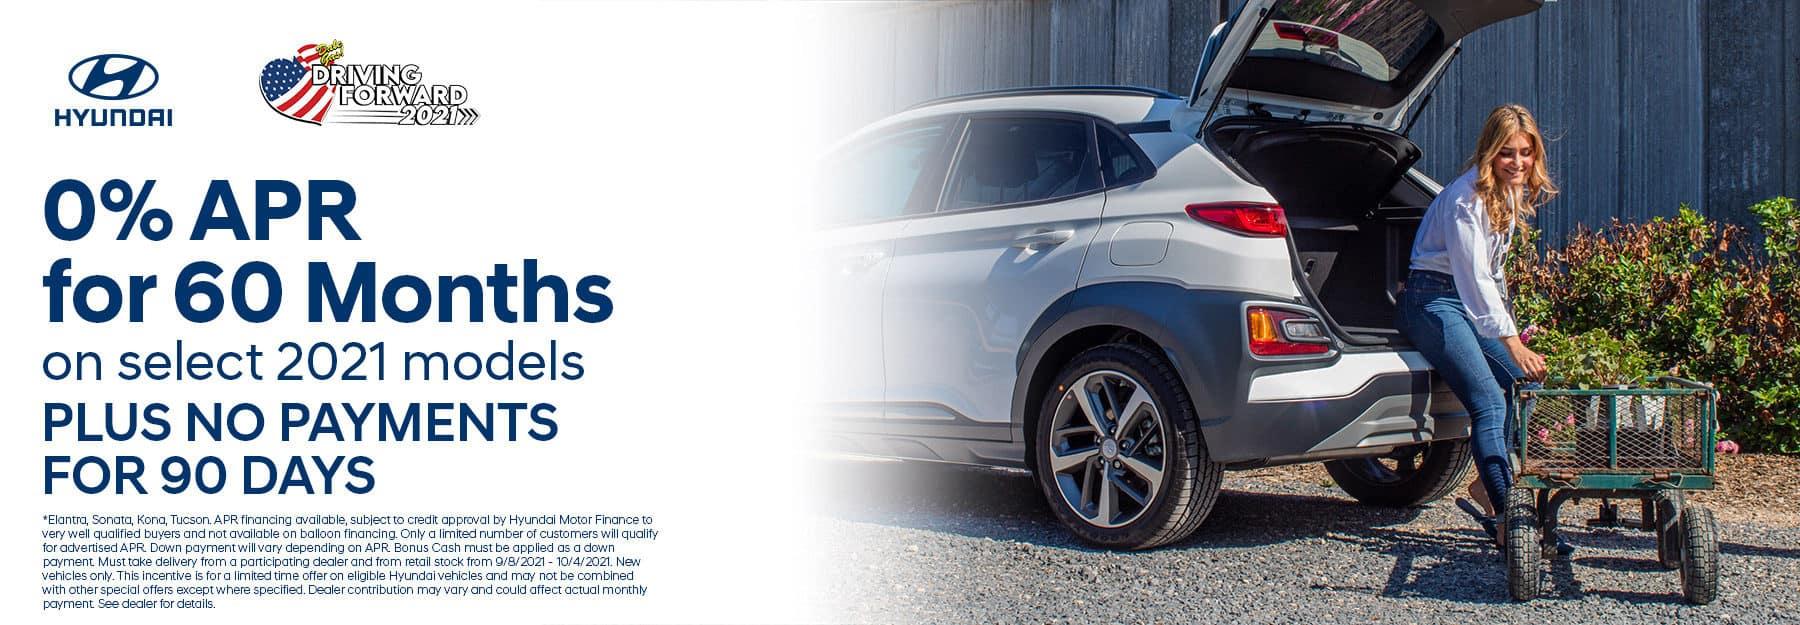 Hyundai Offers   Bert Ogden Hyundai in Harlingen, Texas